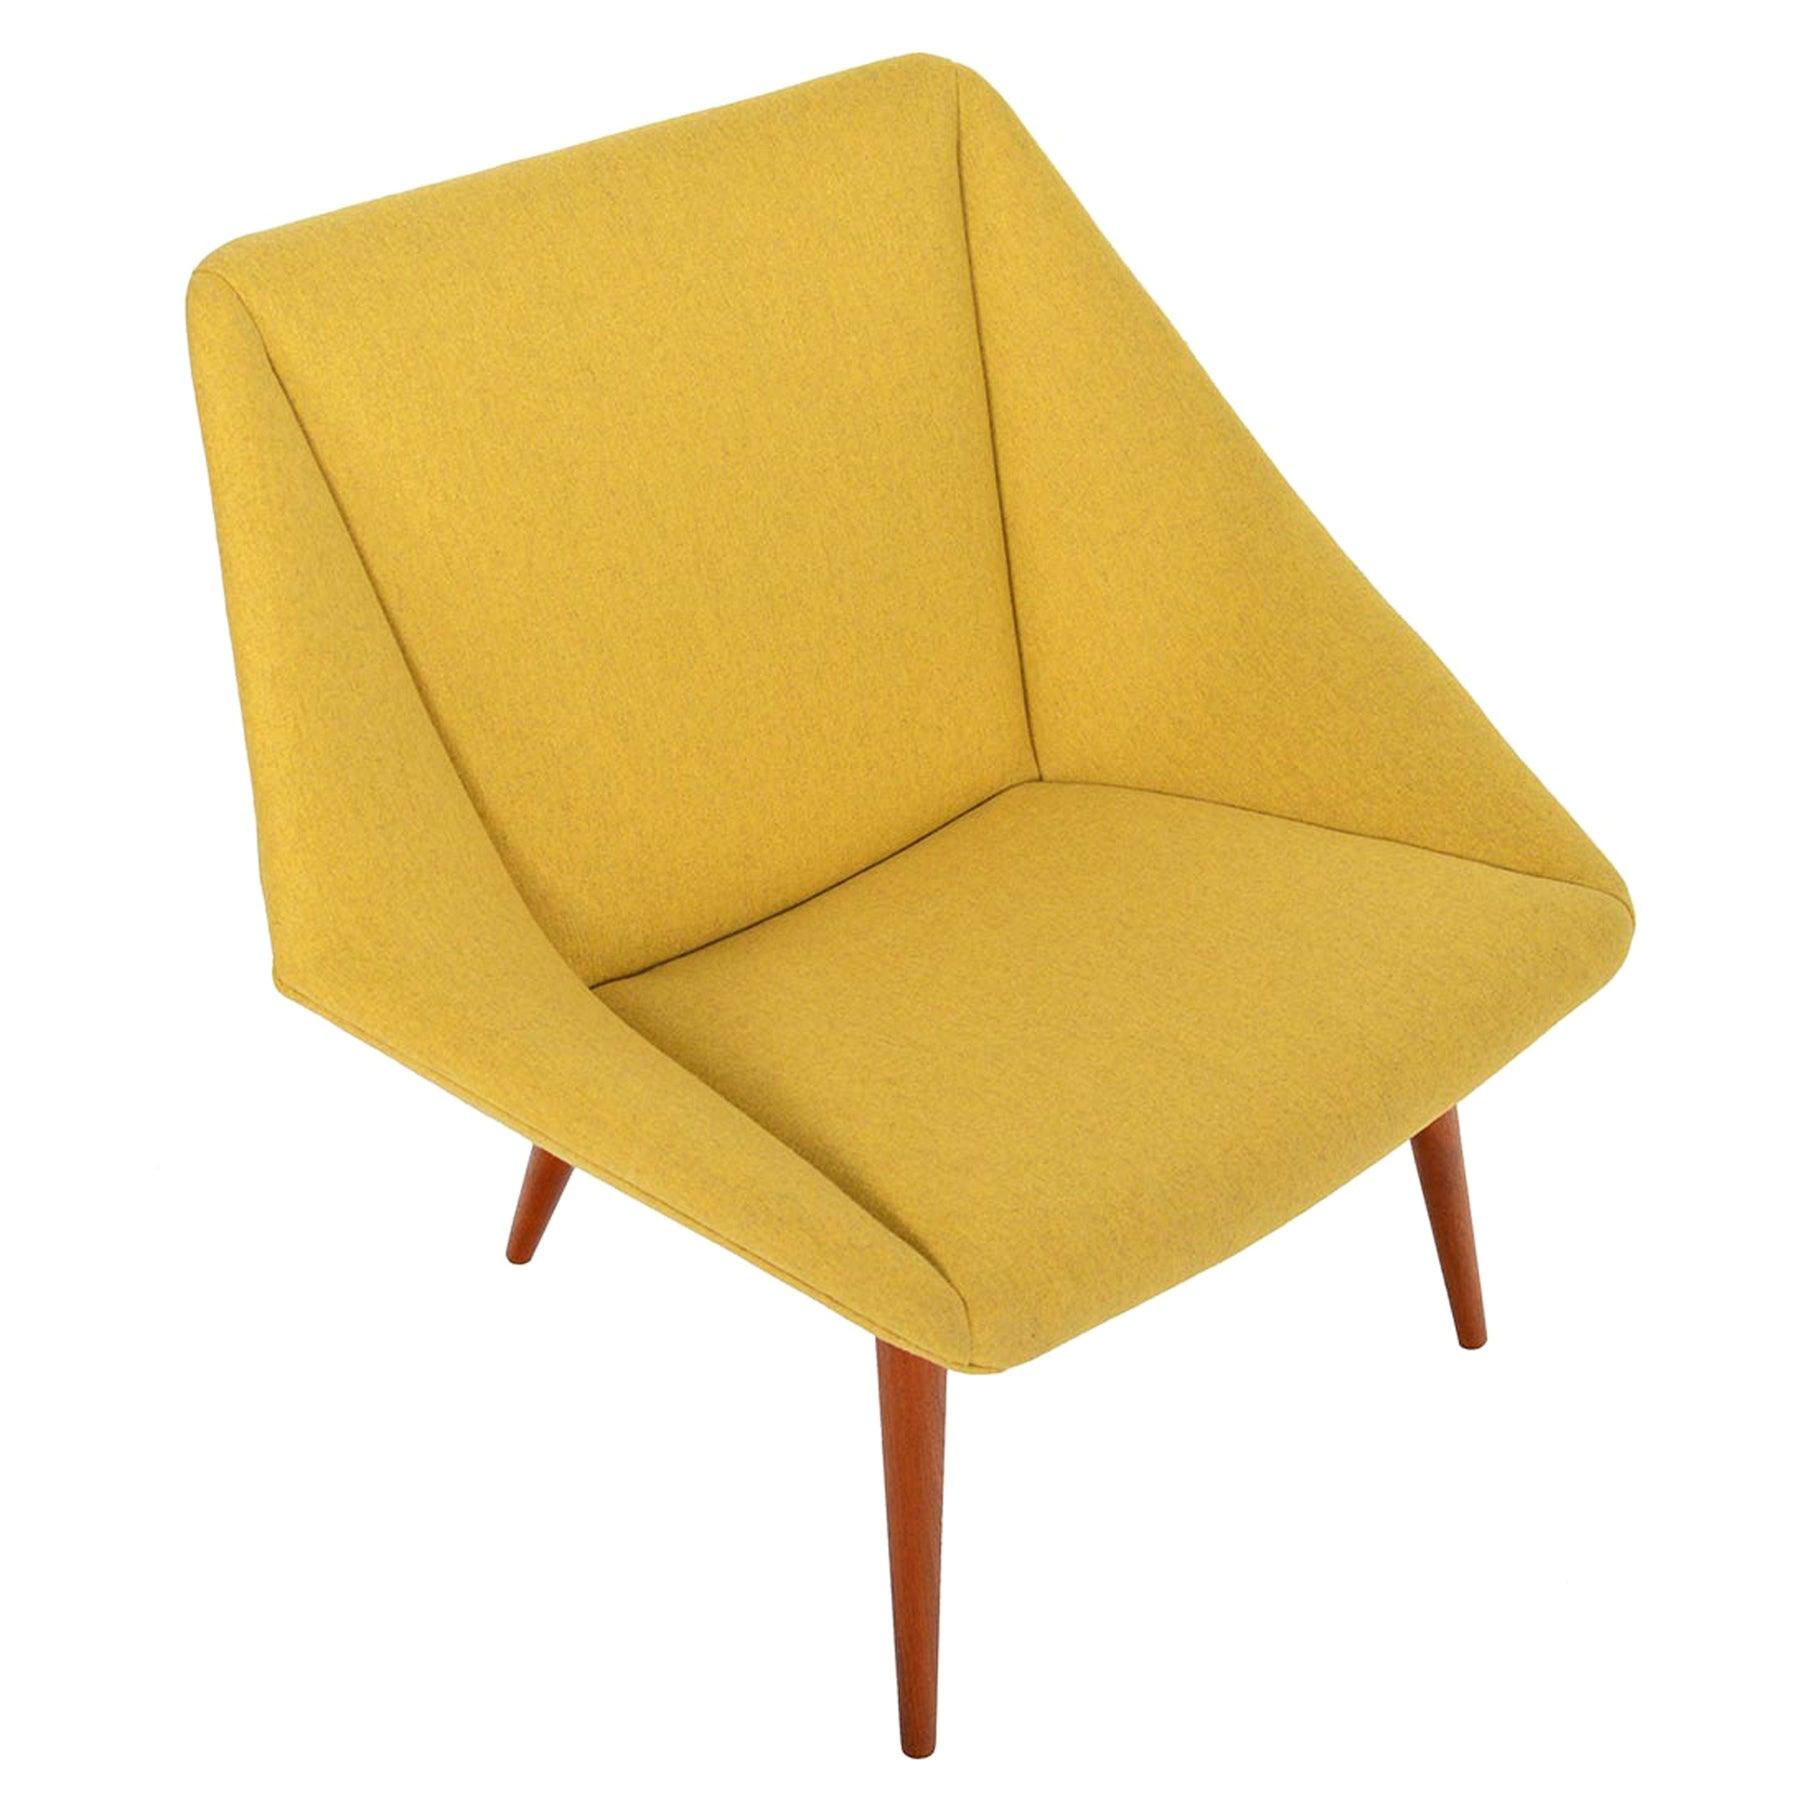 Nanna Ditzel Model 93 Tux Lounge Chair in Goldenrod